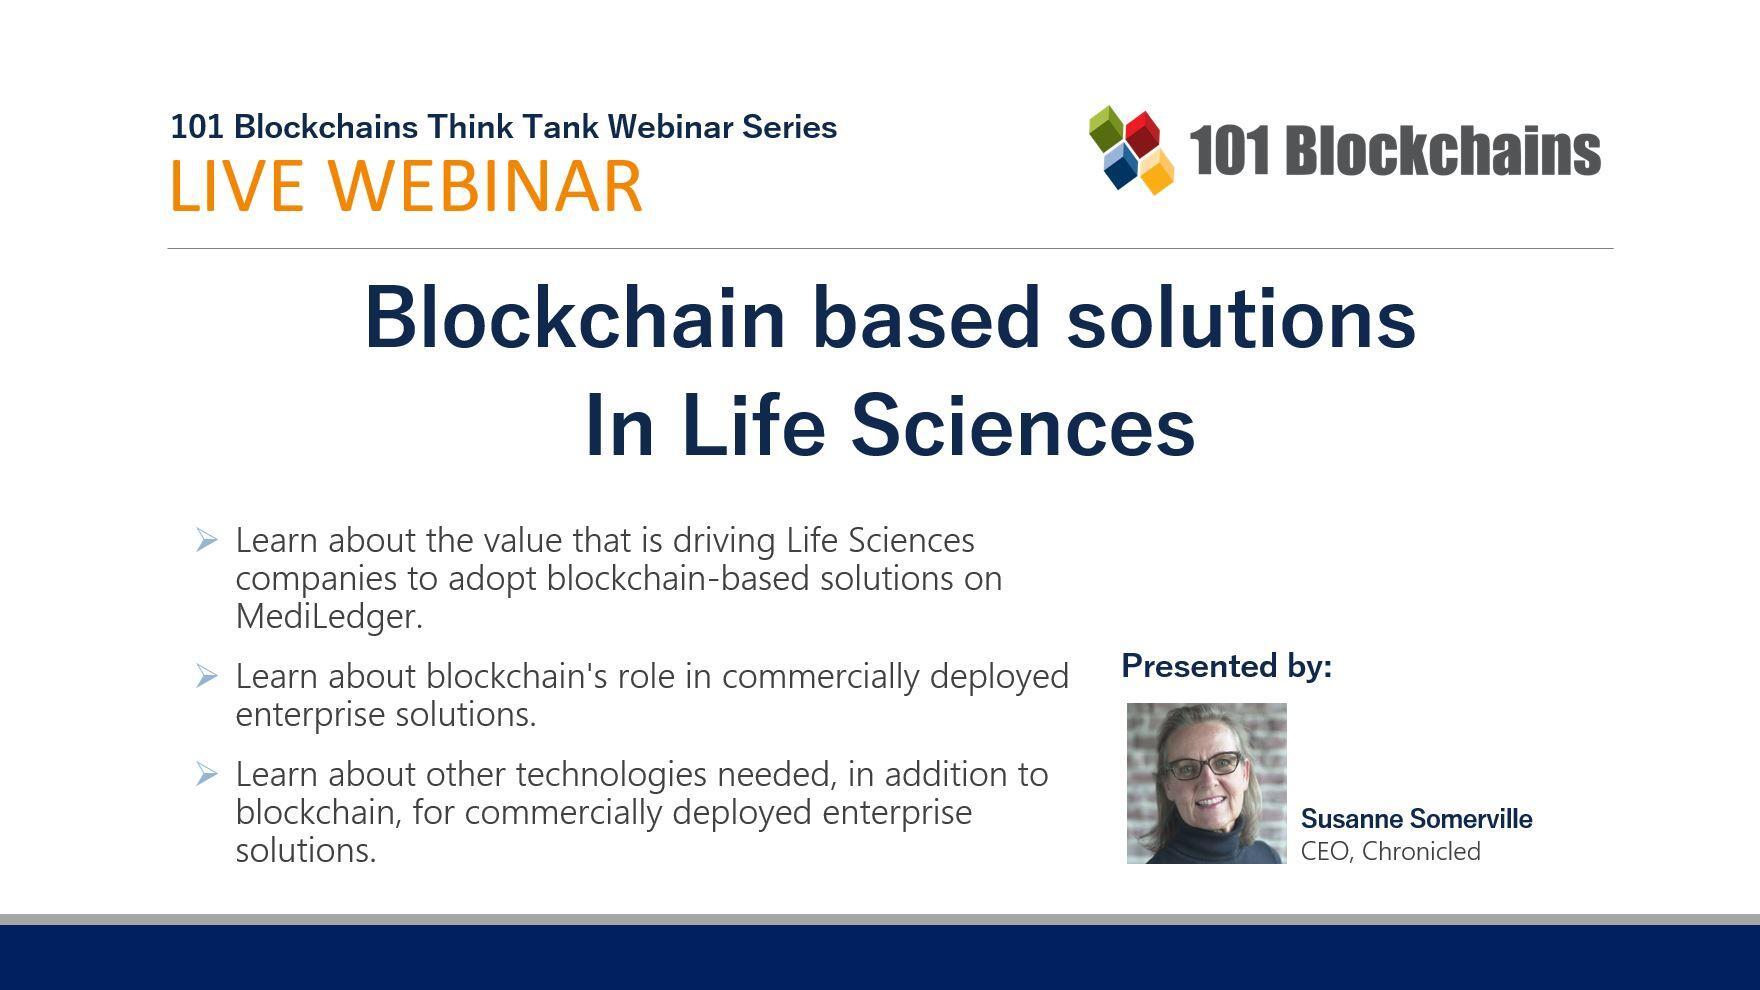 Blockchain based solutions in Life Sciences Webinar